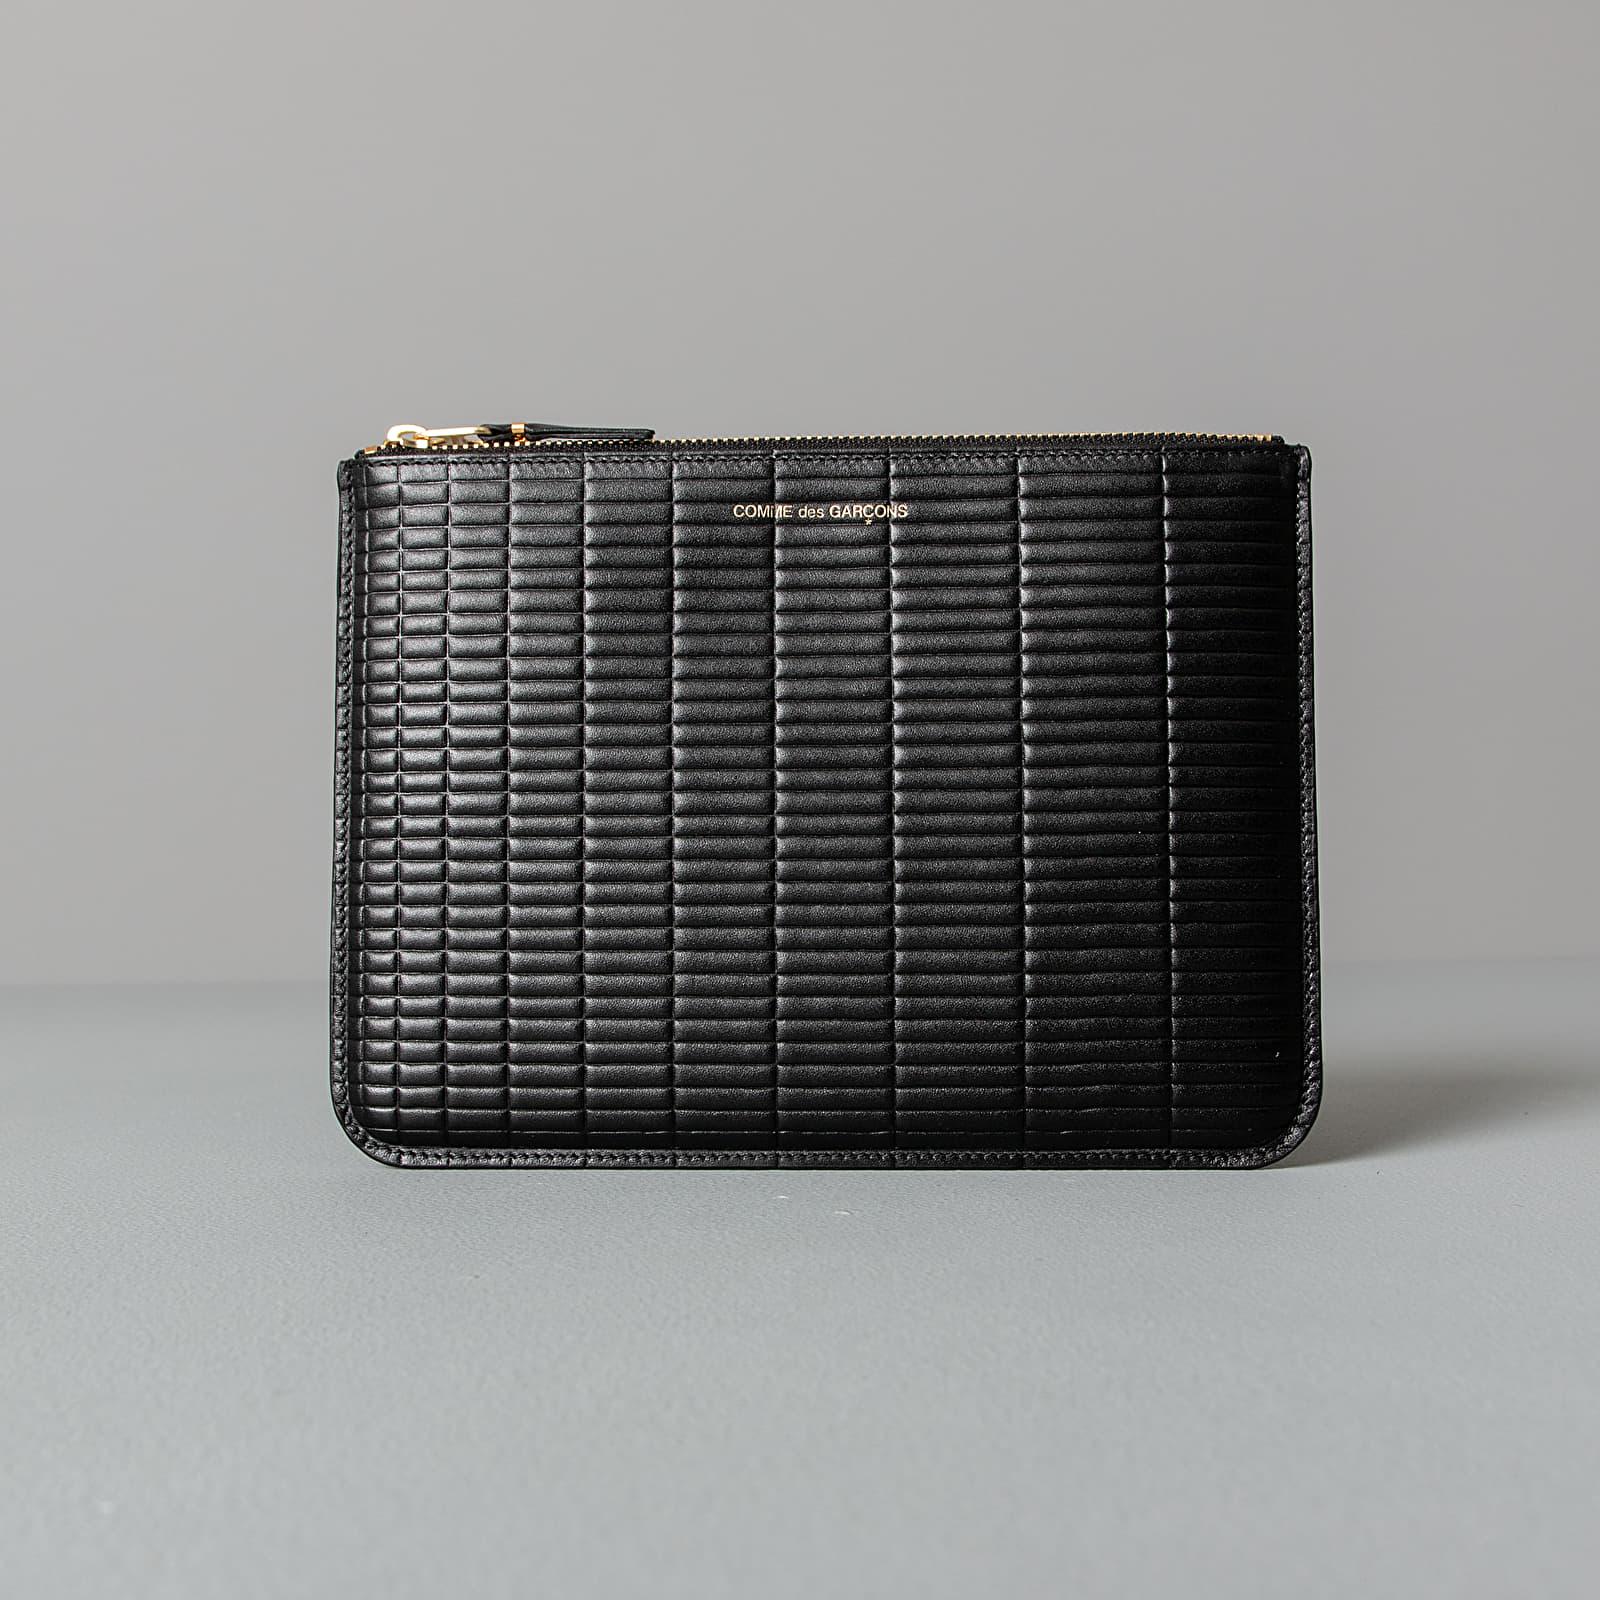 Portafogli Comme des Garçons Brick Line Wallet Black